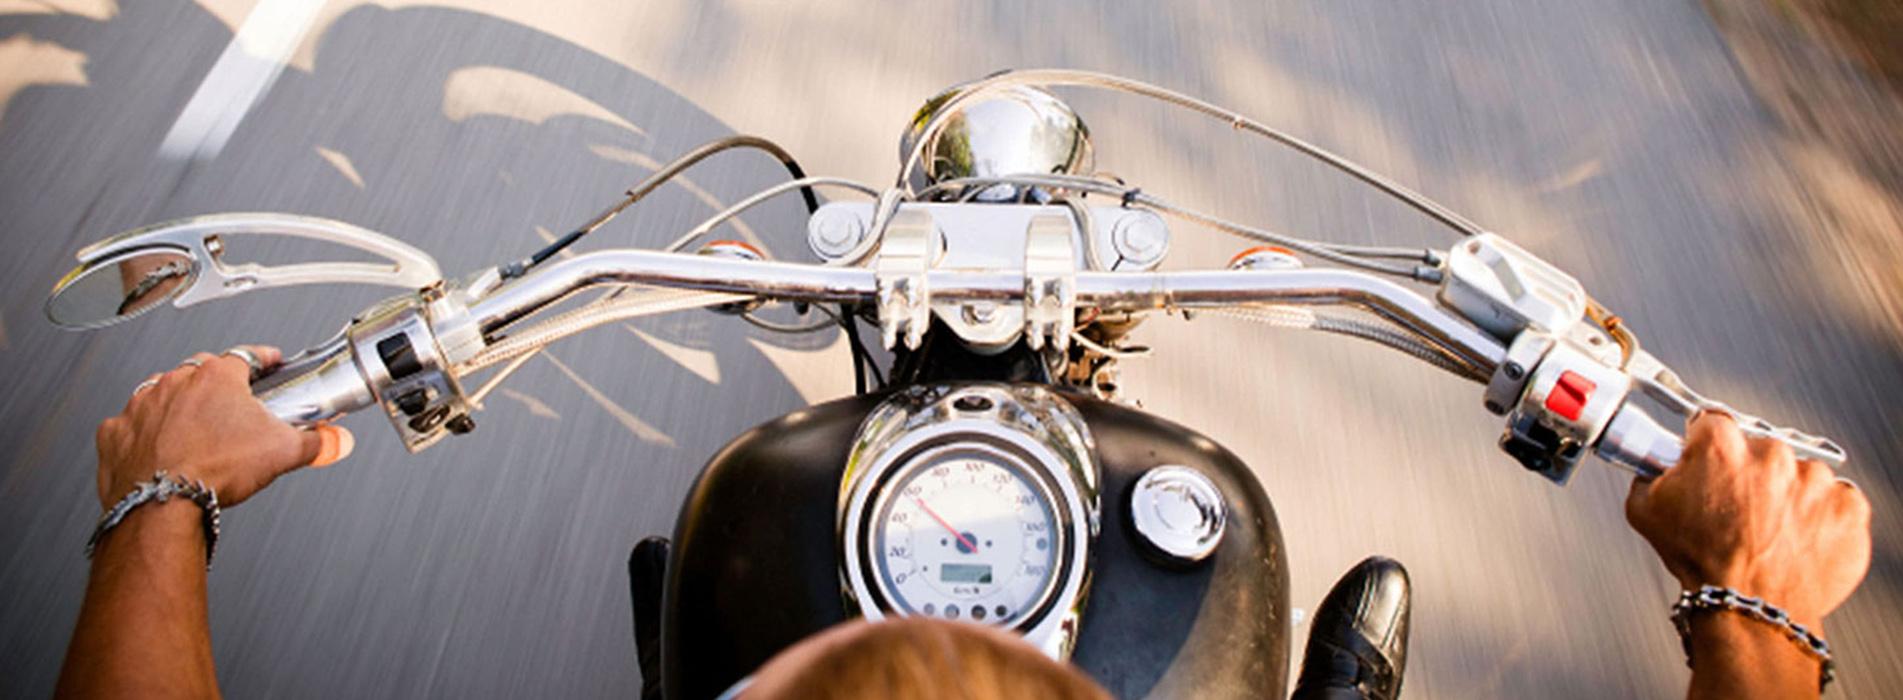 Hutchinson Ks Motorcycle Insurance Agents Dj Kauffman Agency Inc